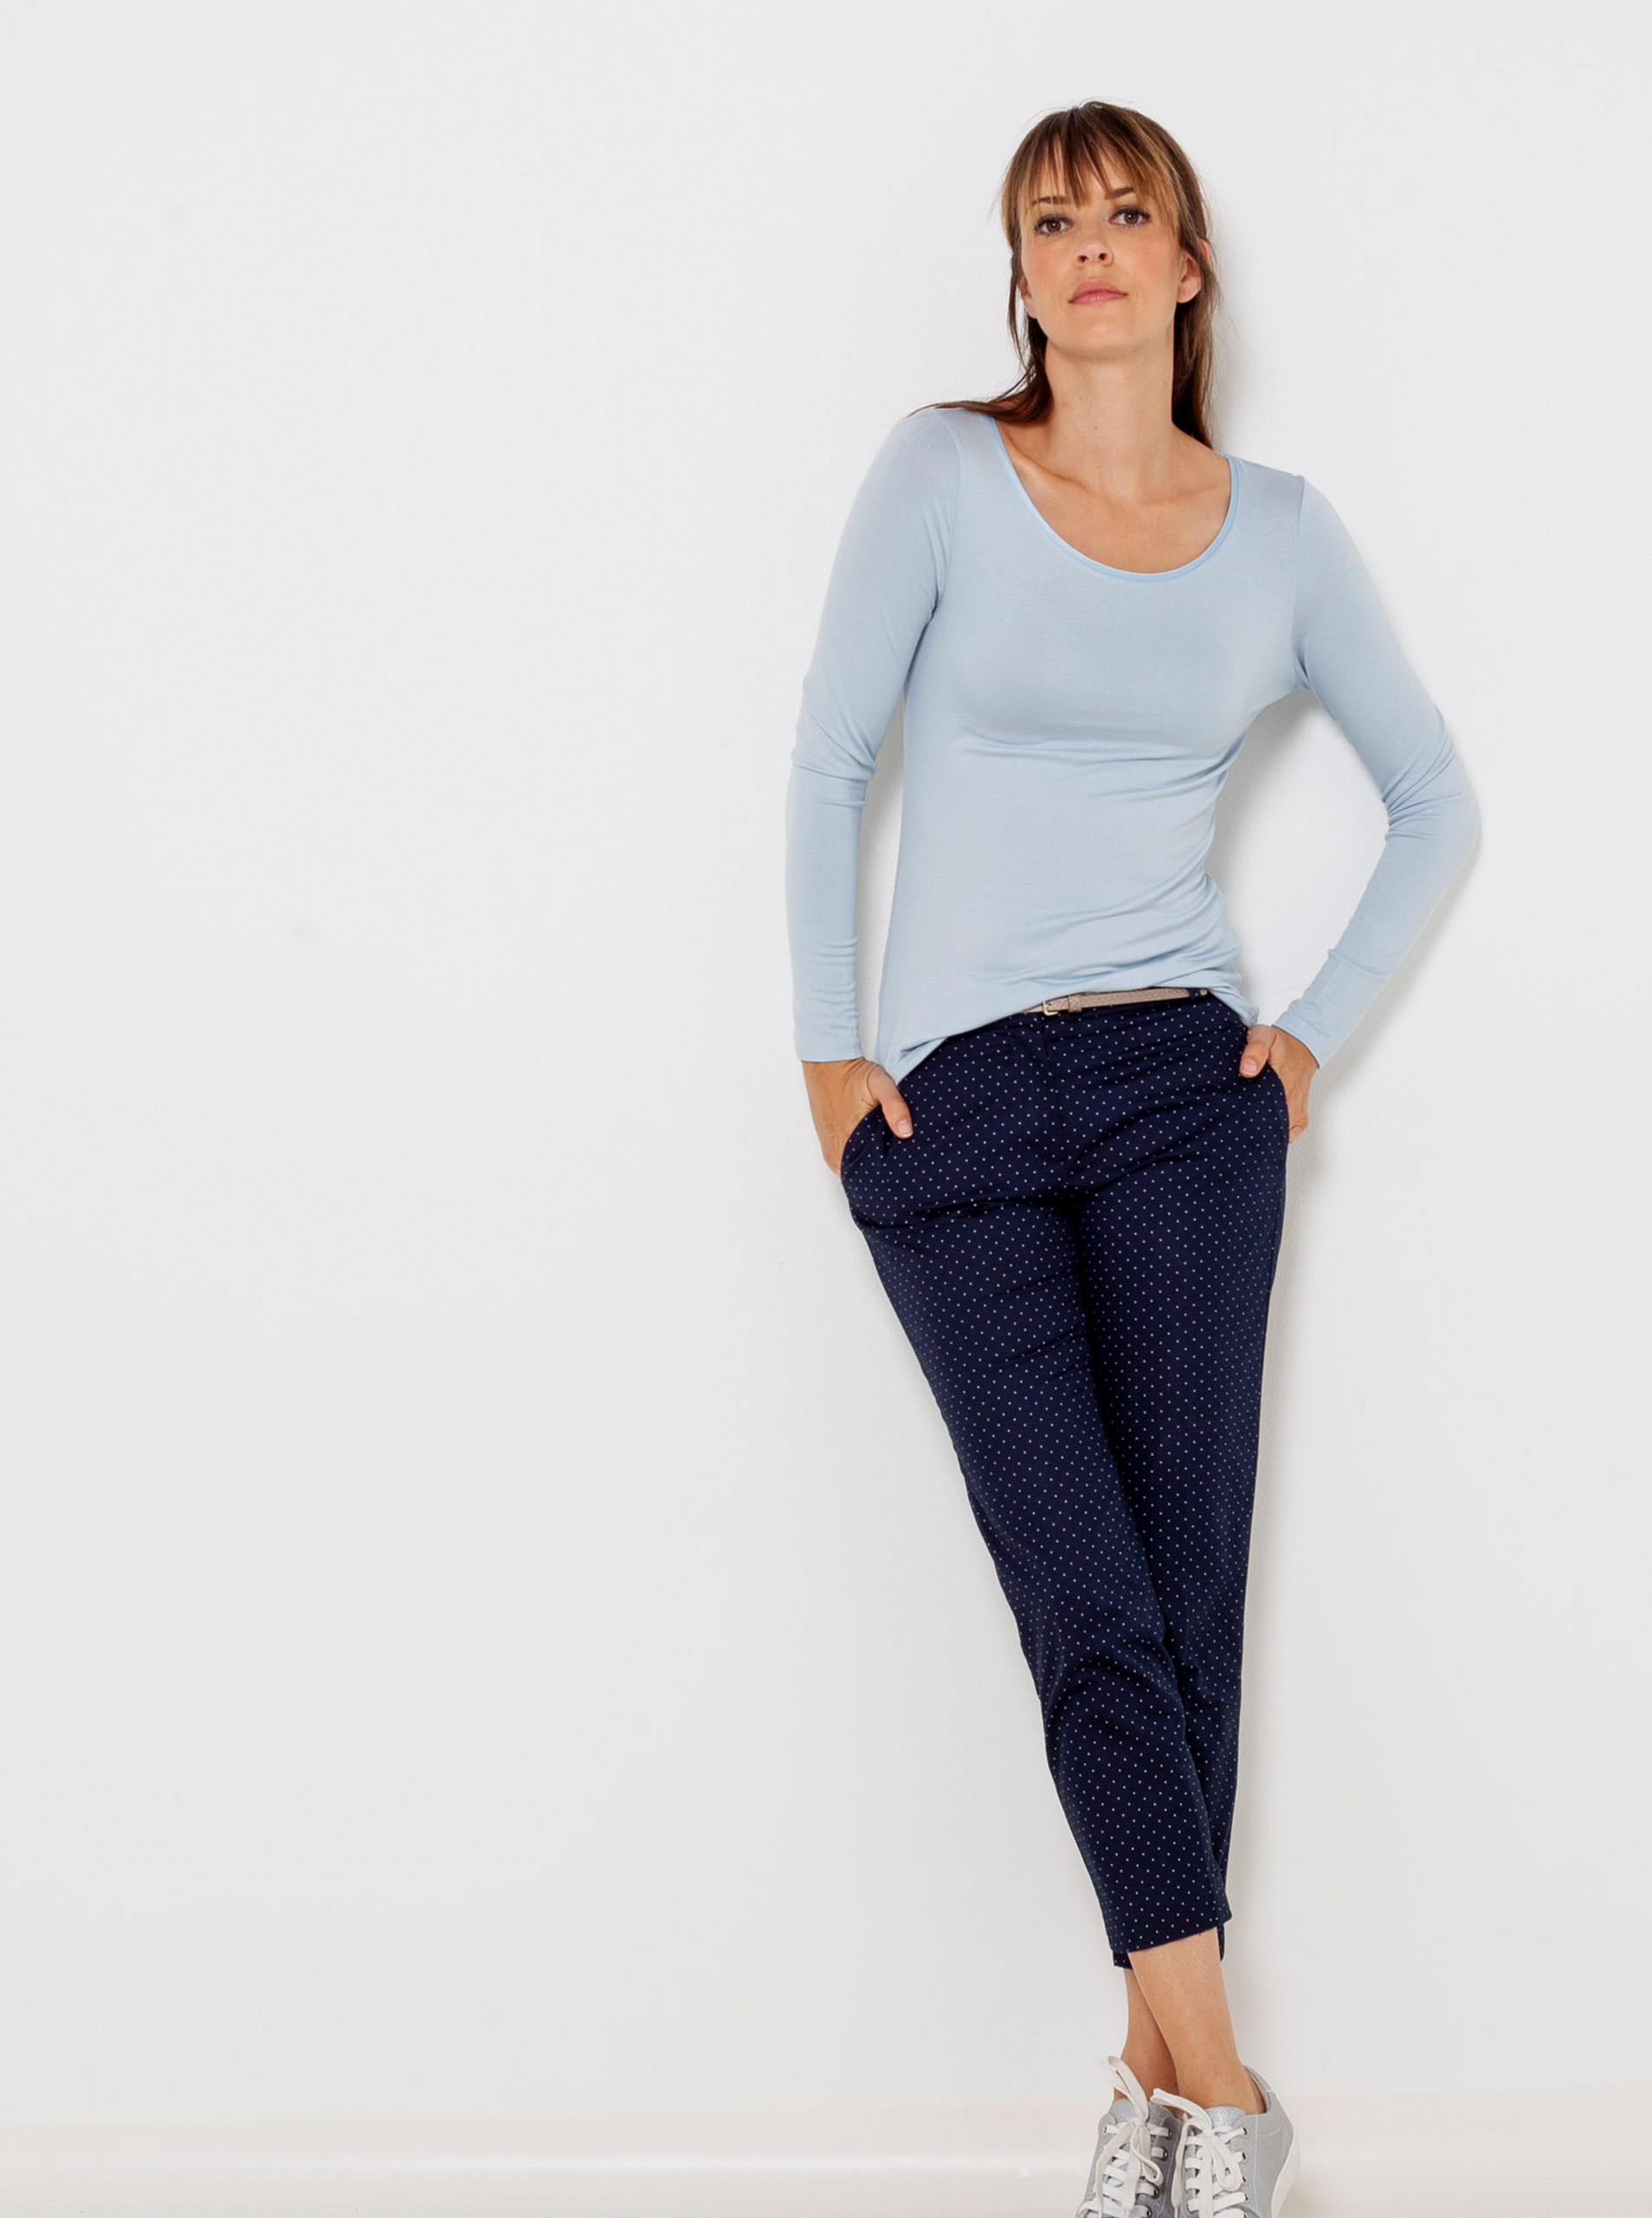 CAMAIEU blue women´s T-shirt